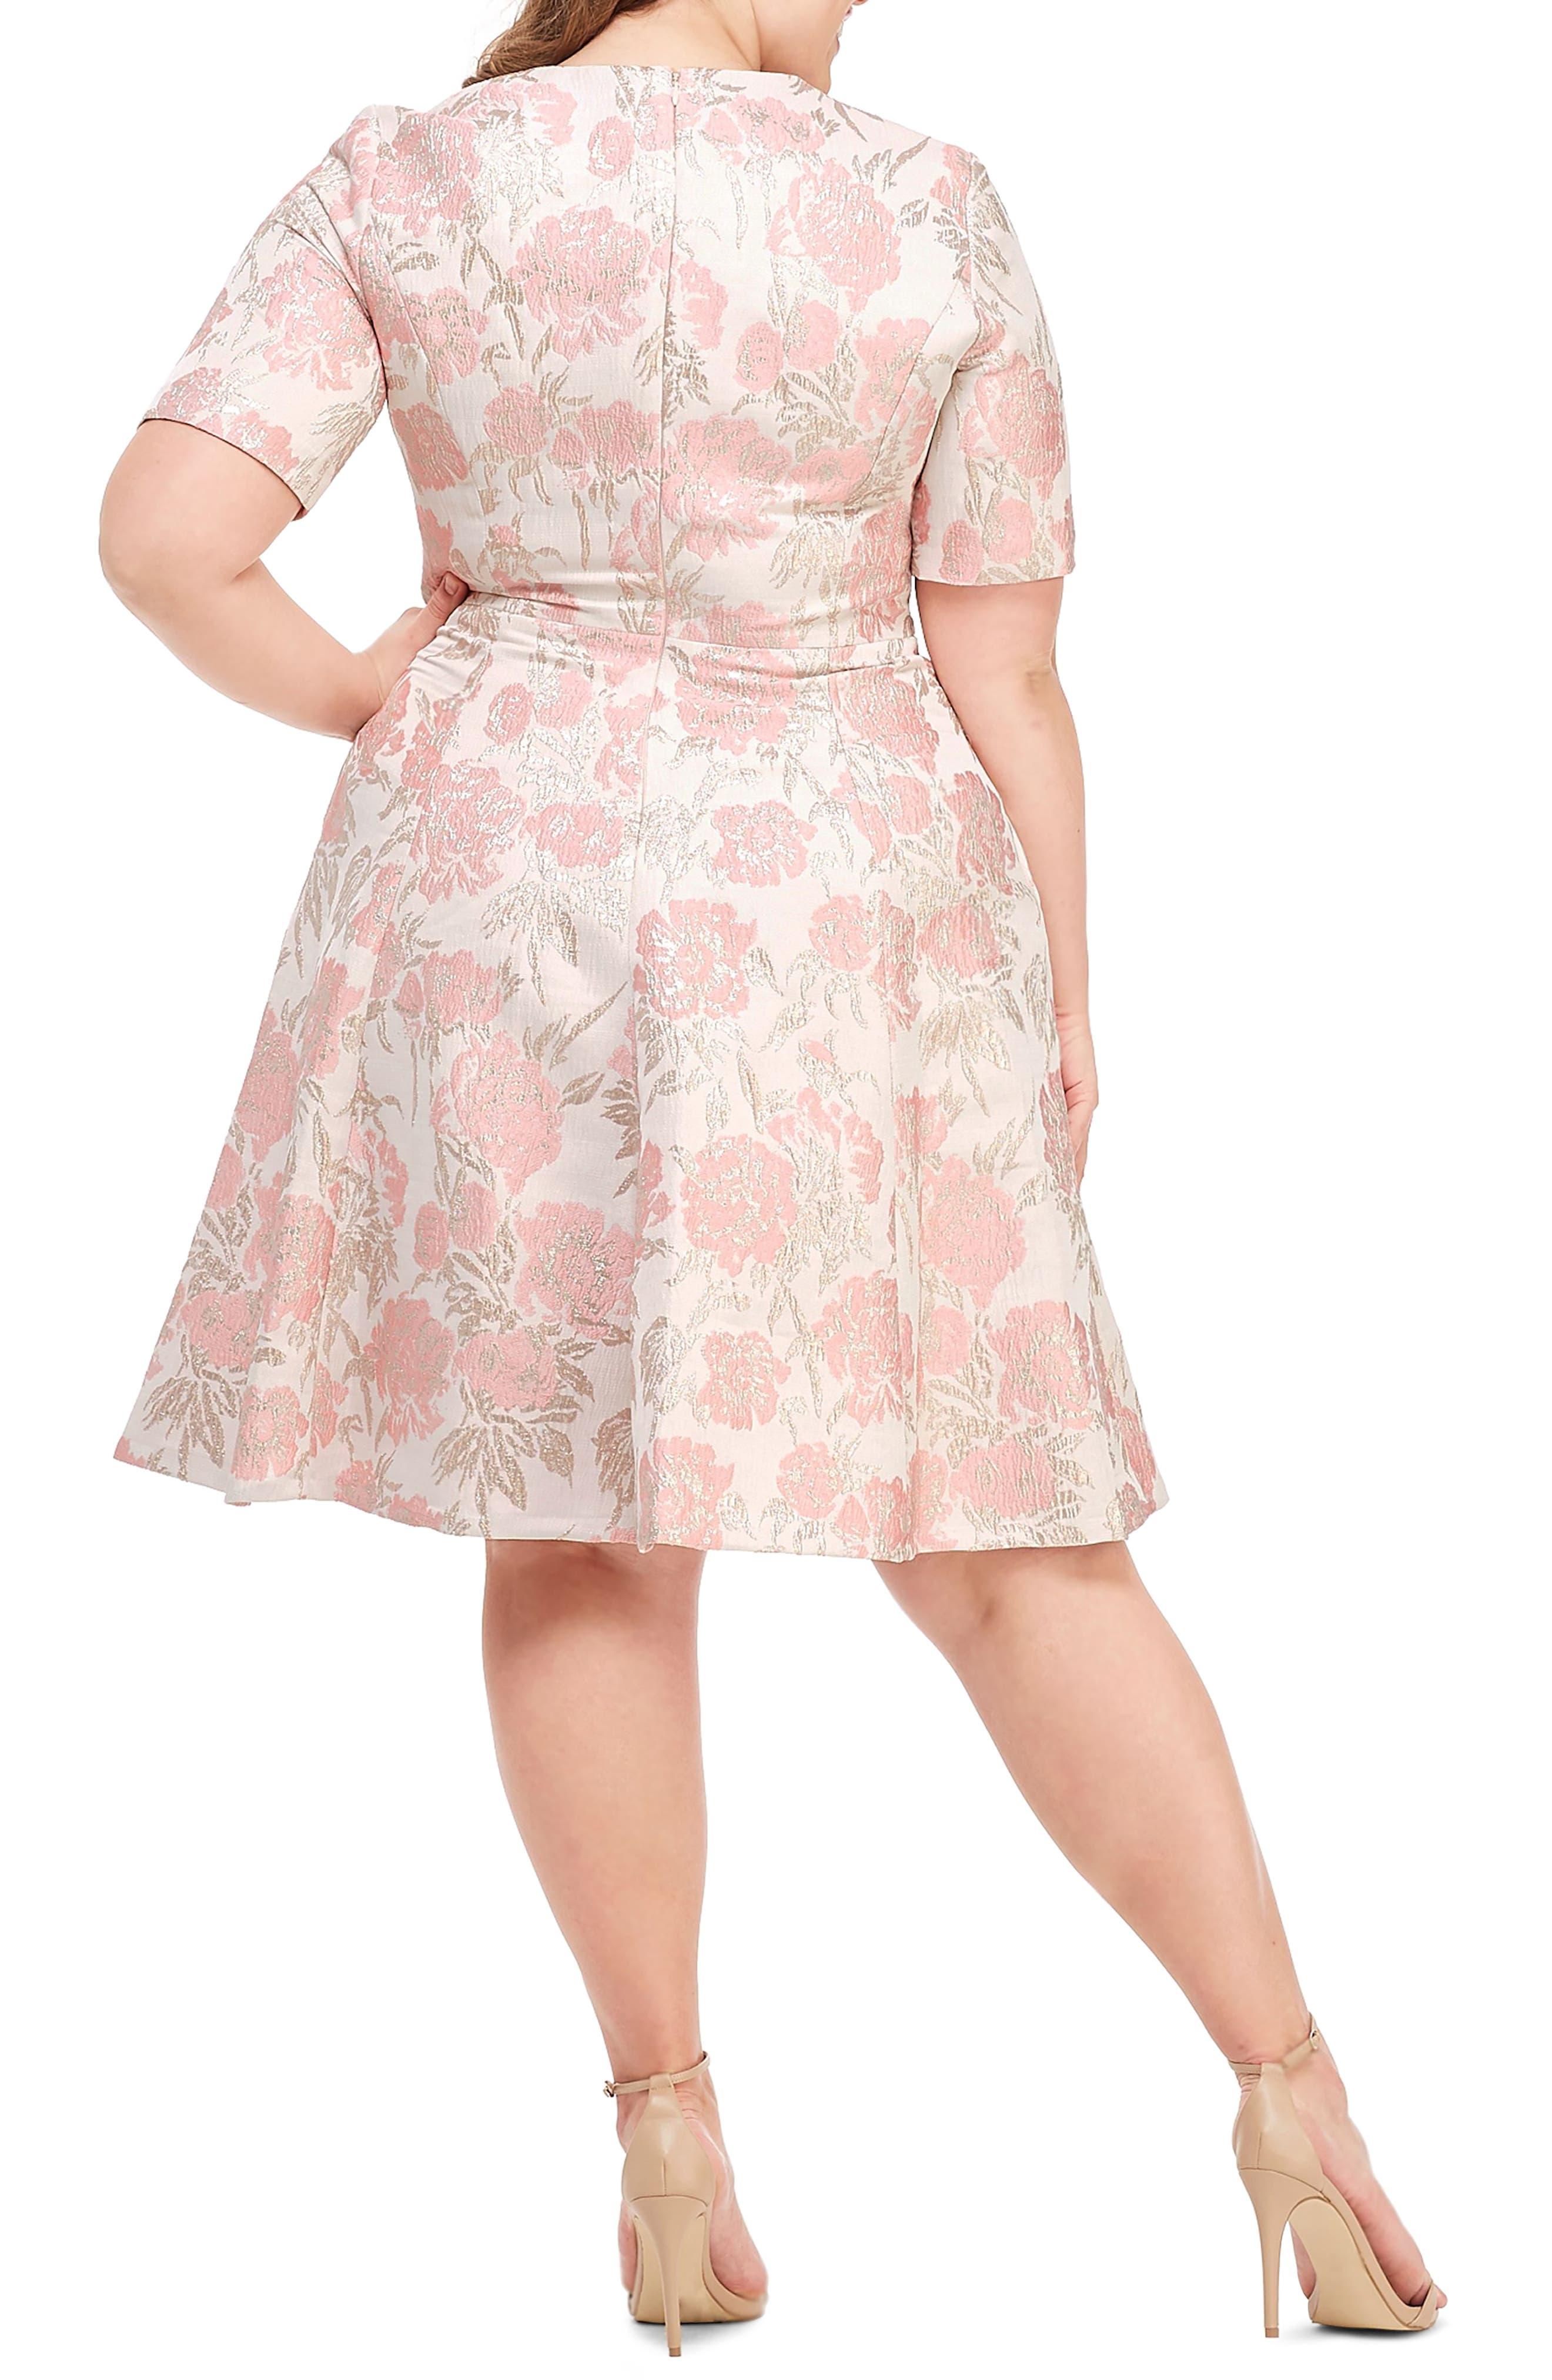 Adair Pink Passion Rose Jacquard Fit & Flare Dress,                             Alternate thumbnail 8, color,                             PINK PEARL